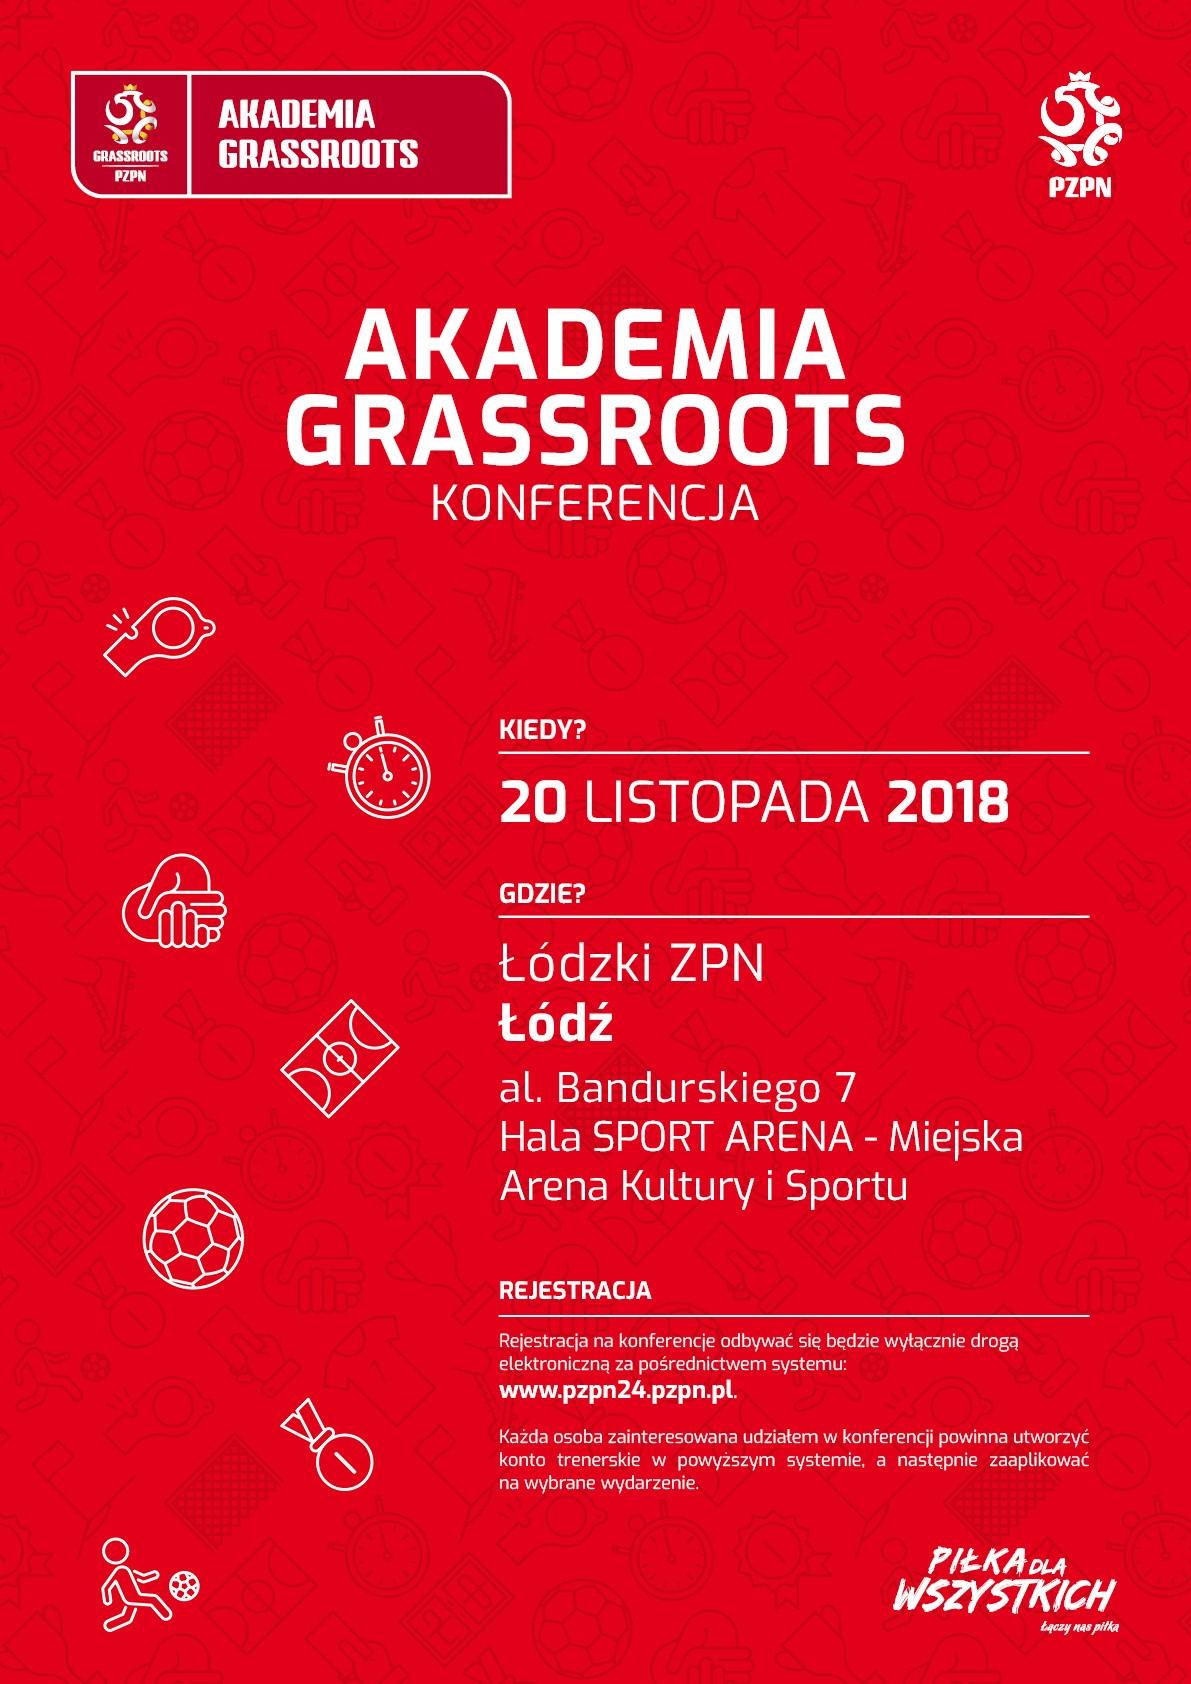 Akademia Grassroots